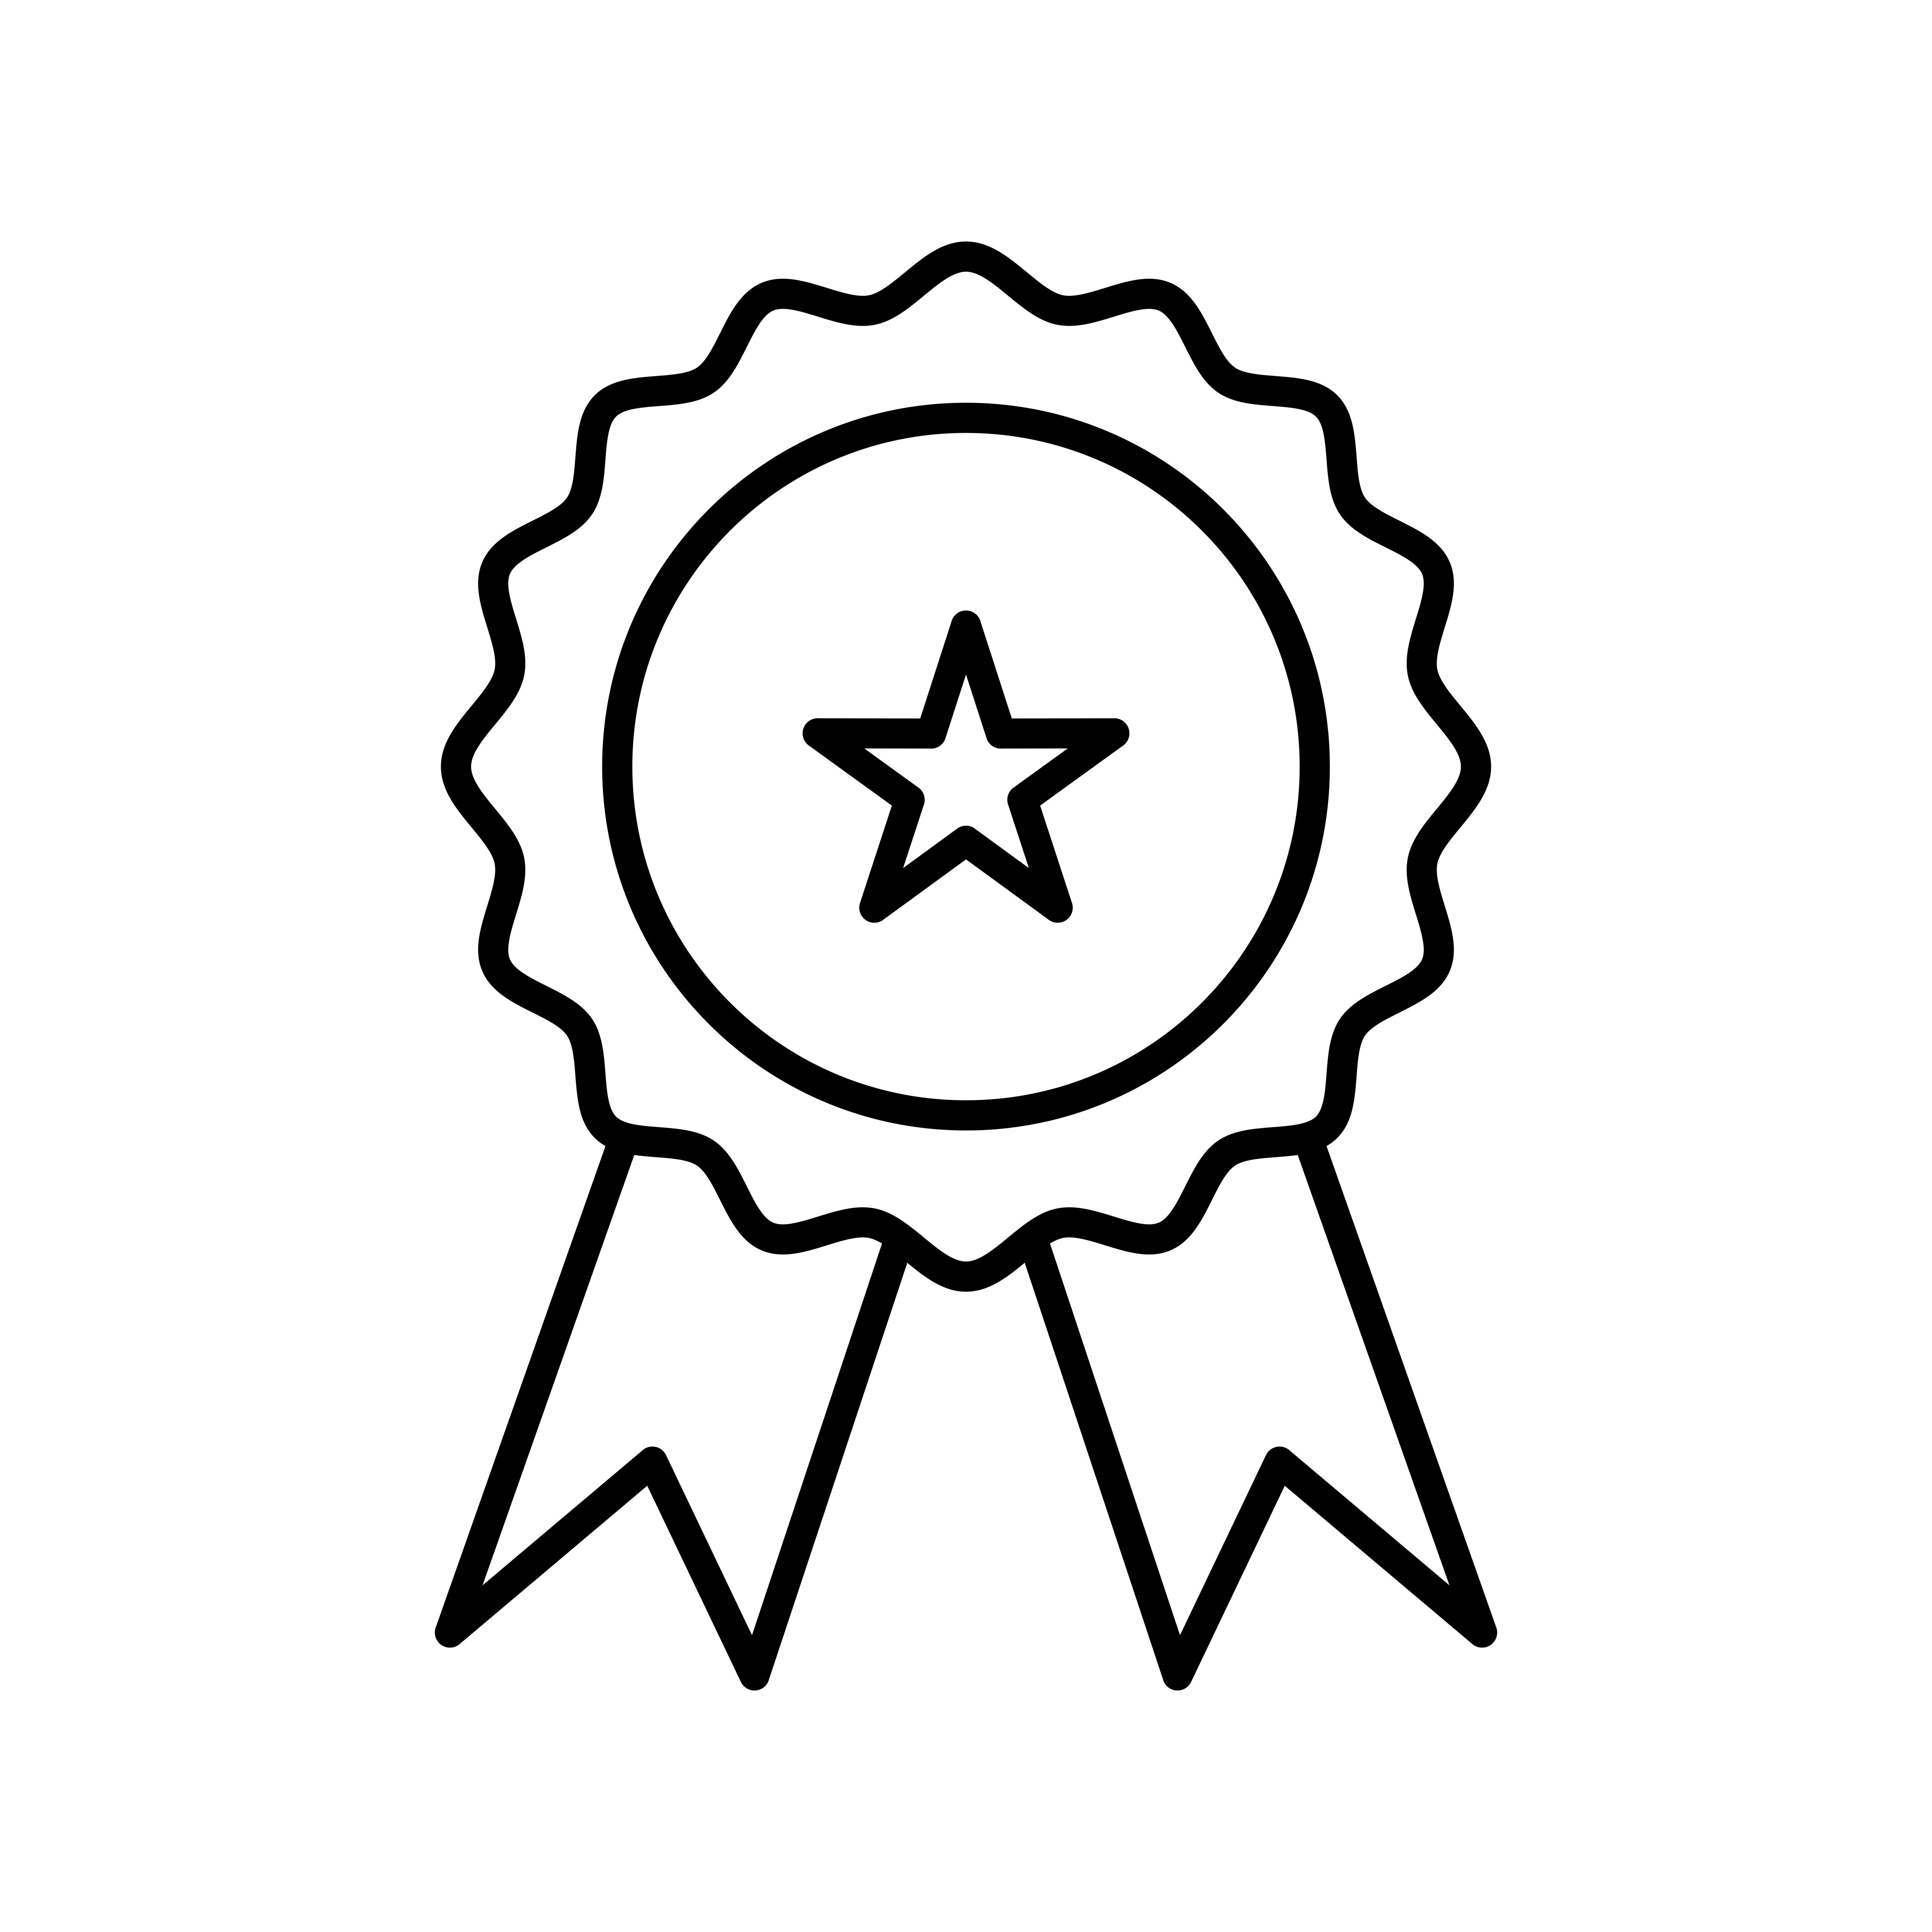 Medal Line Black Icon